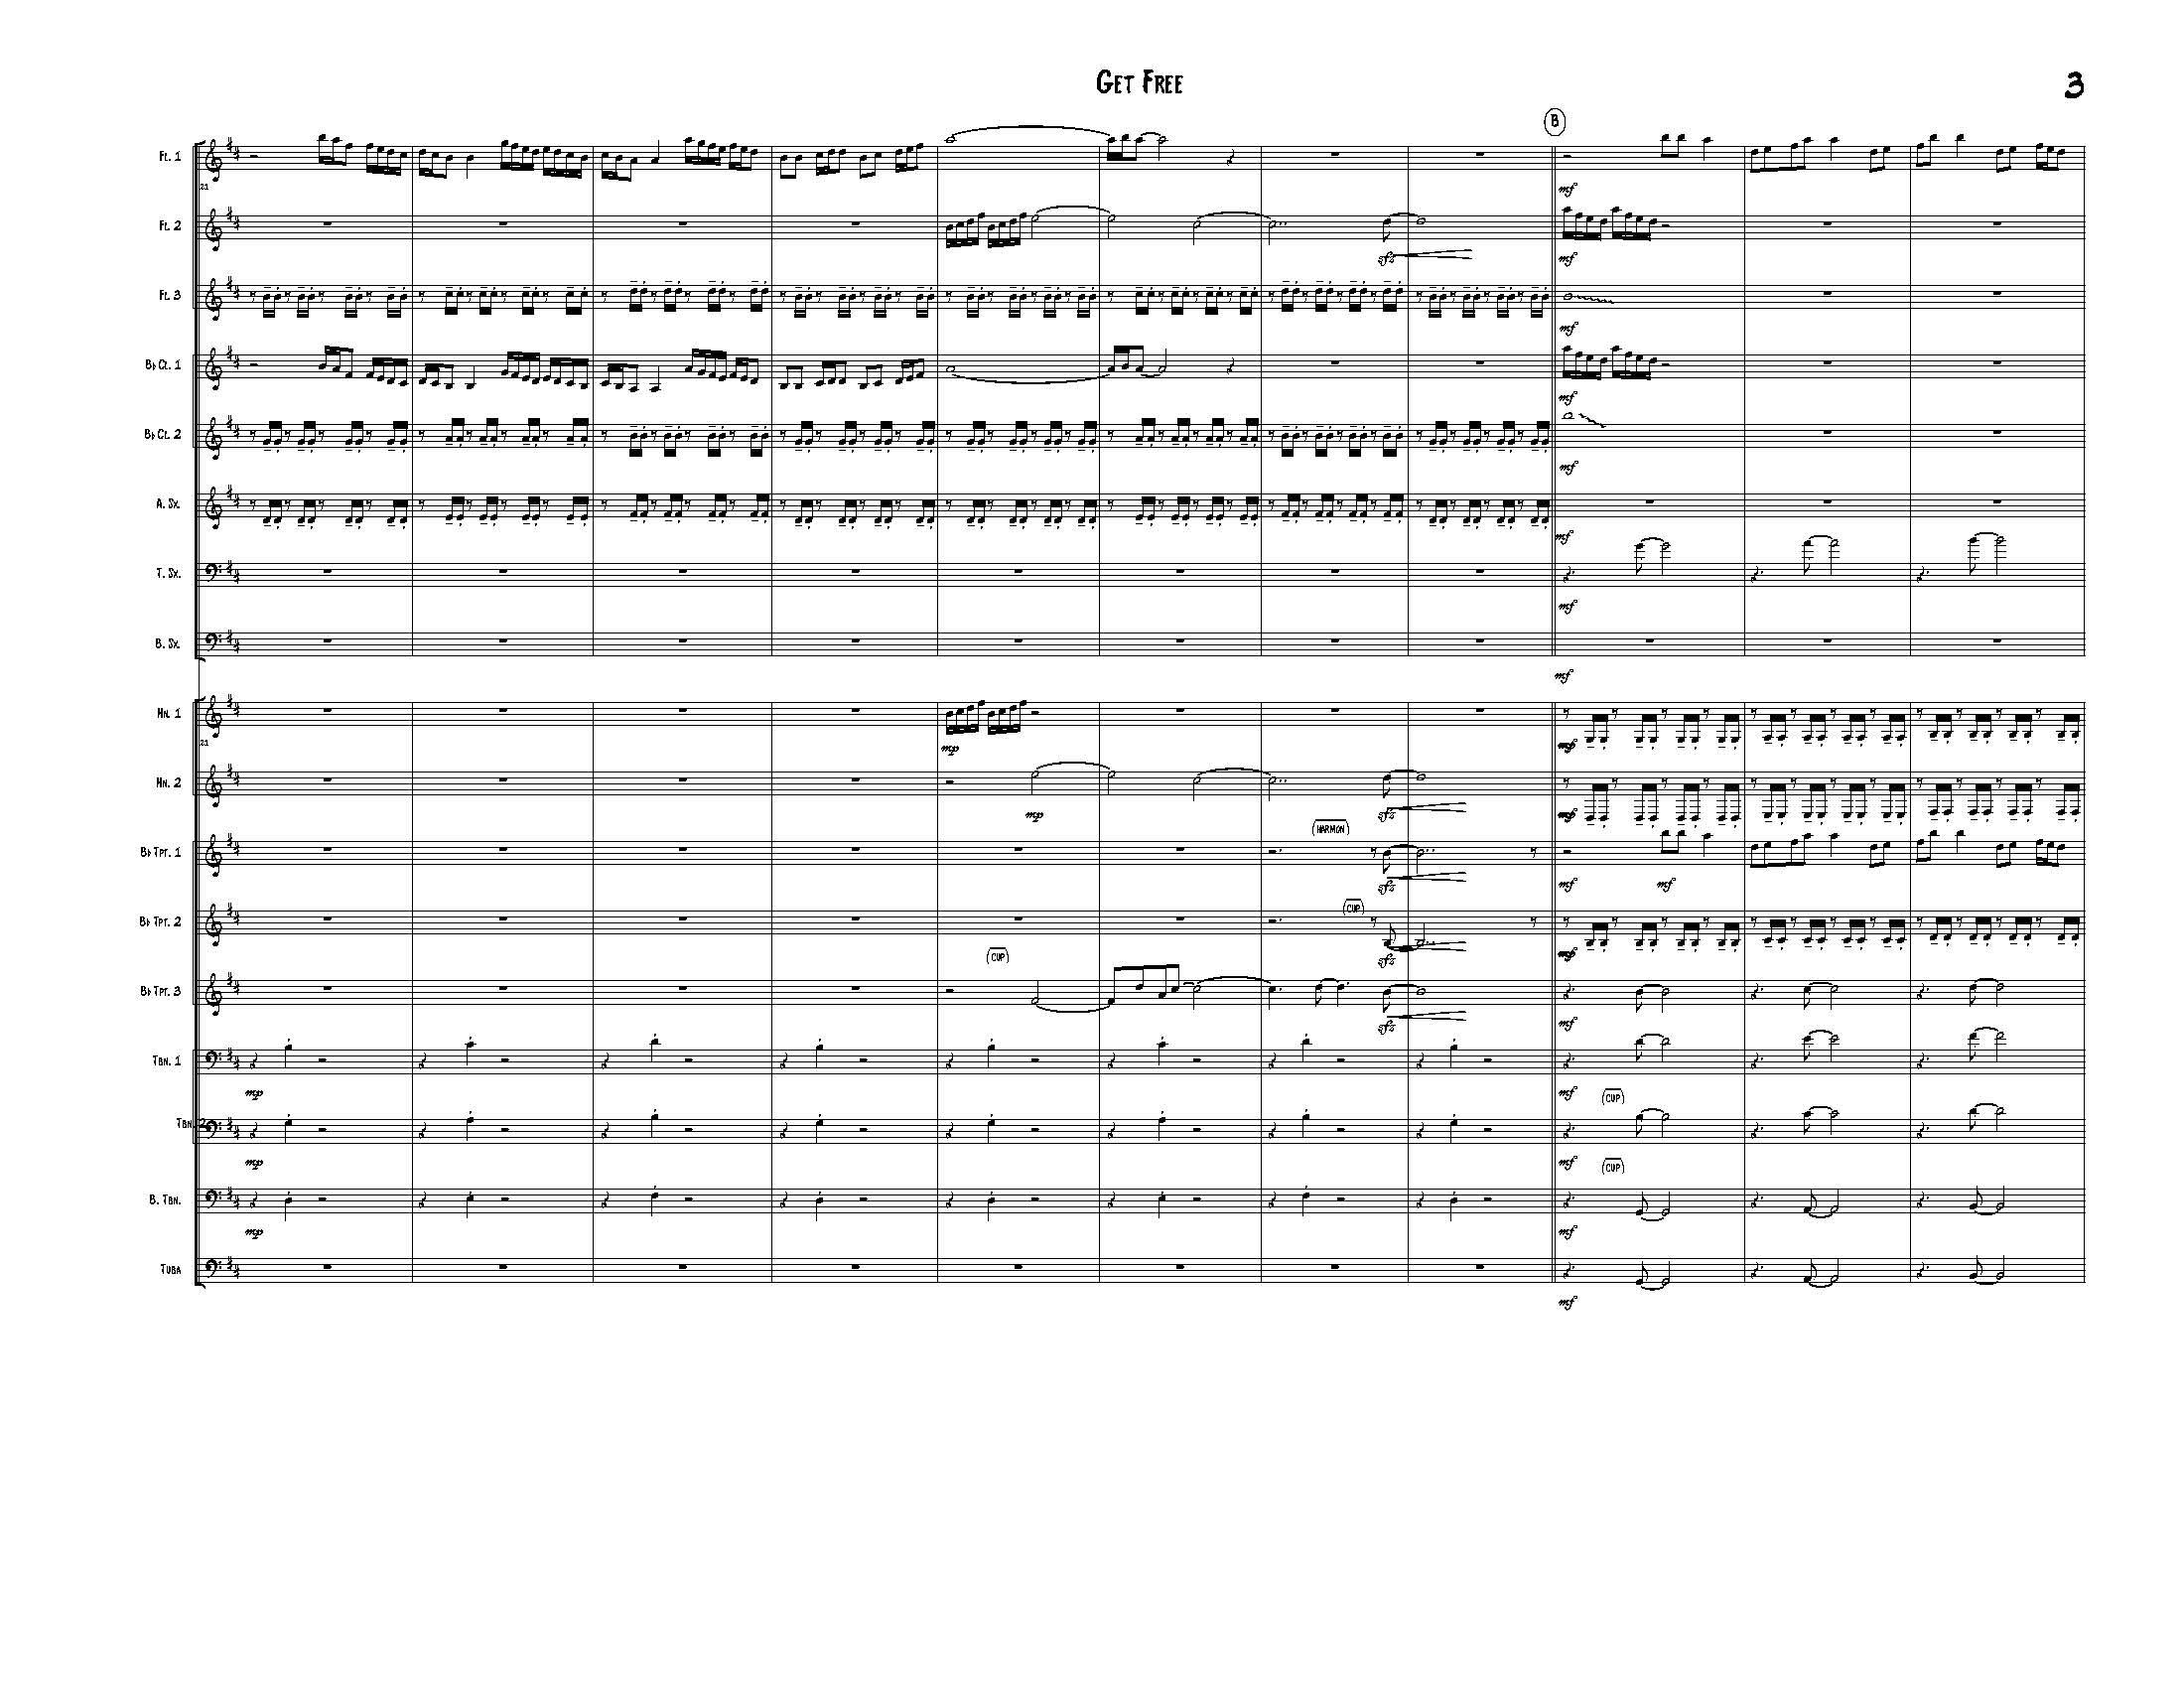 Get Free BKLYN 1834 Score_Page_03.jpg